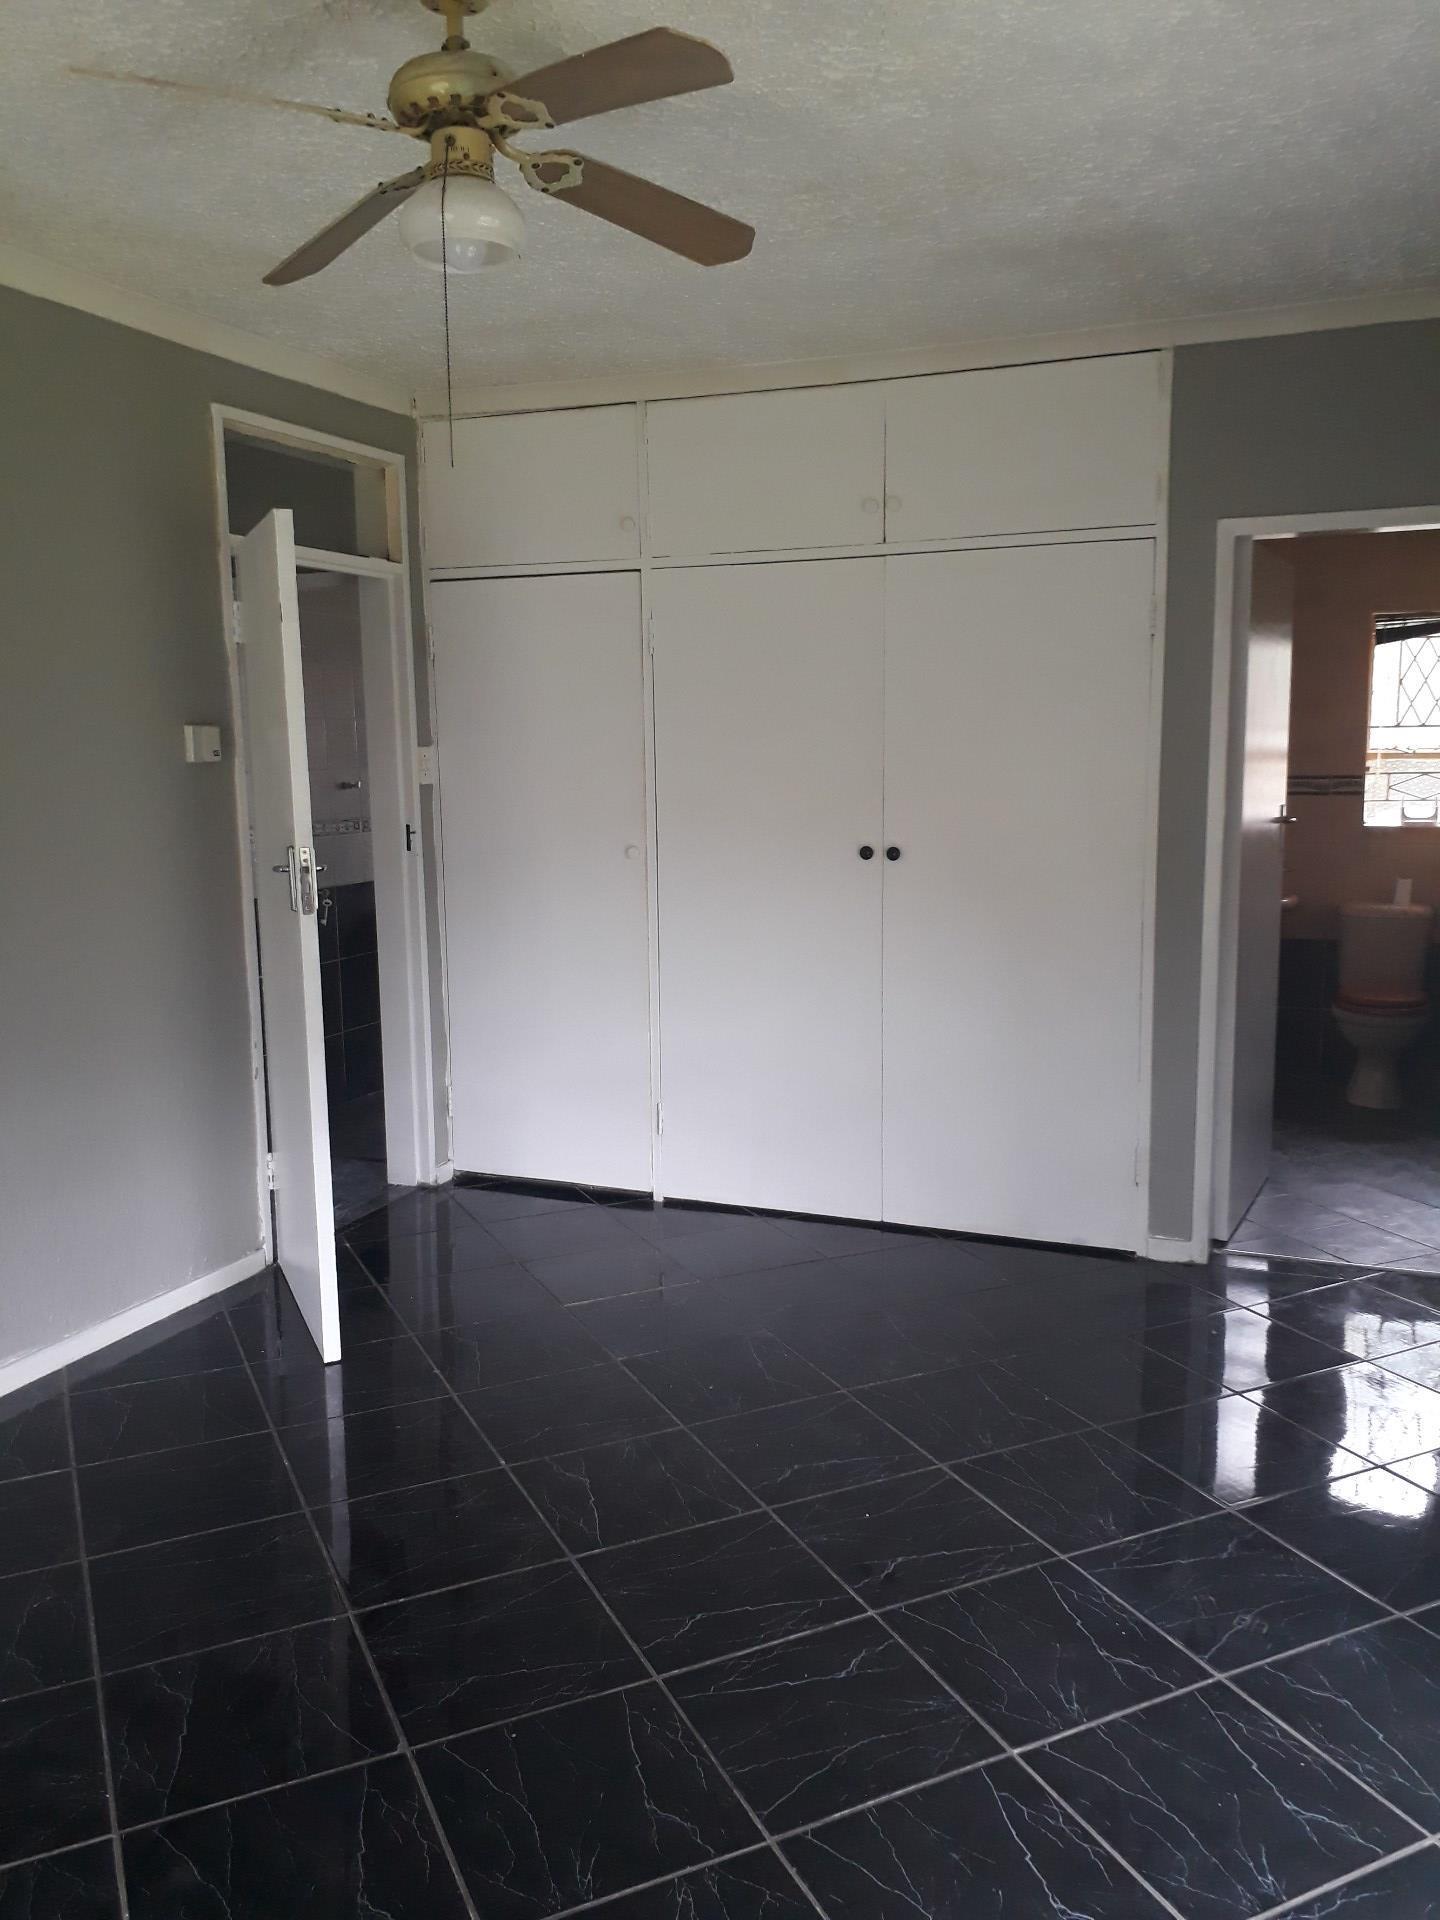 4 Bedroom House For Sale in Del Judor